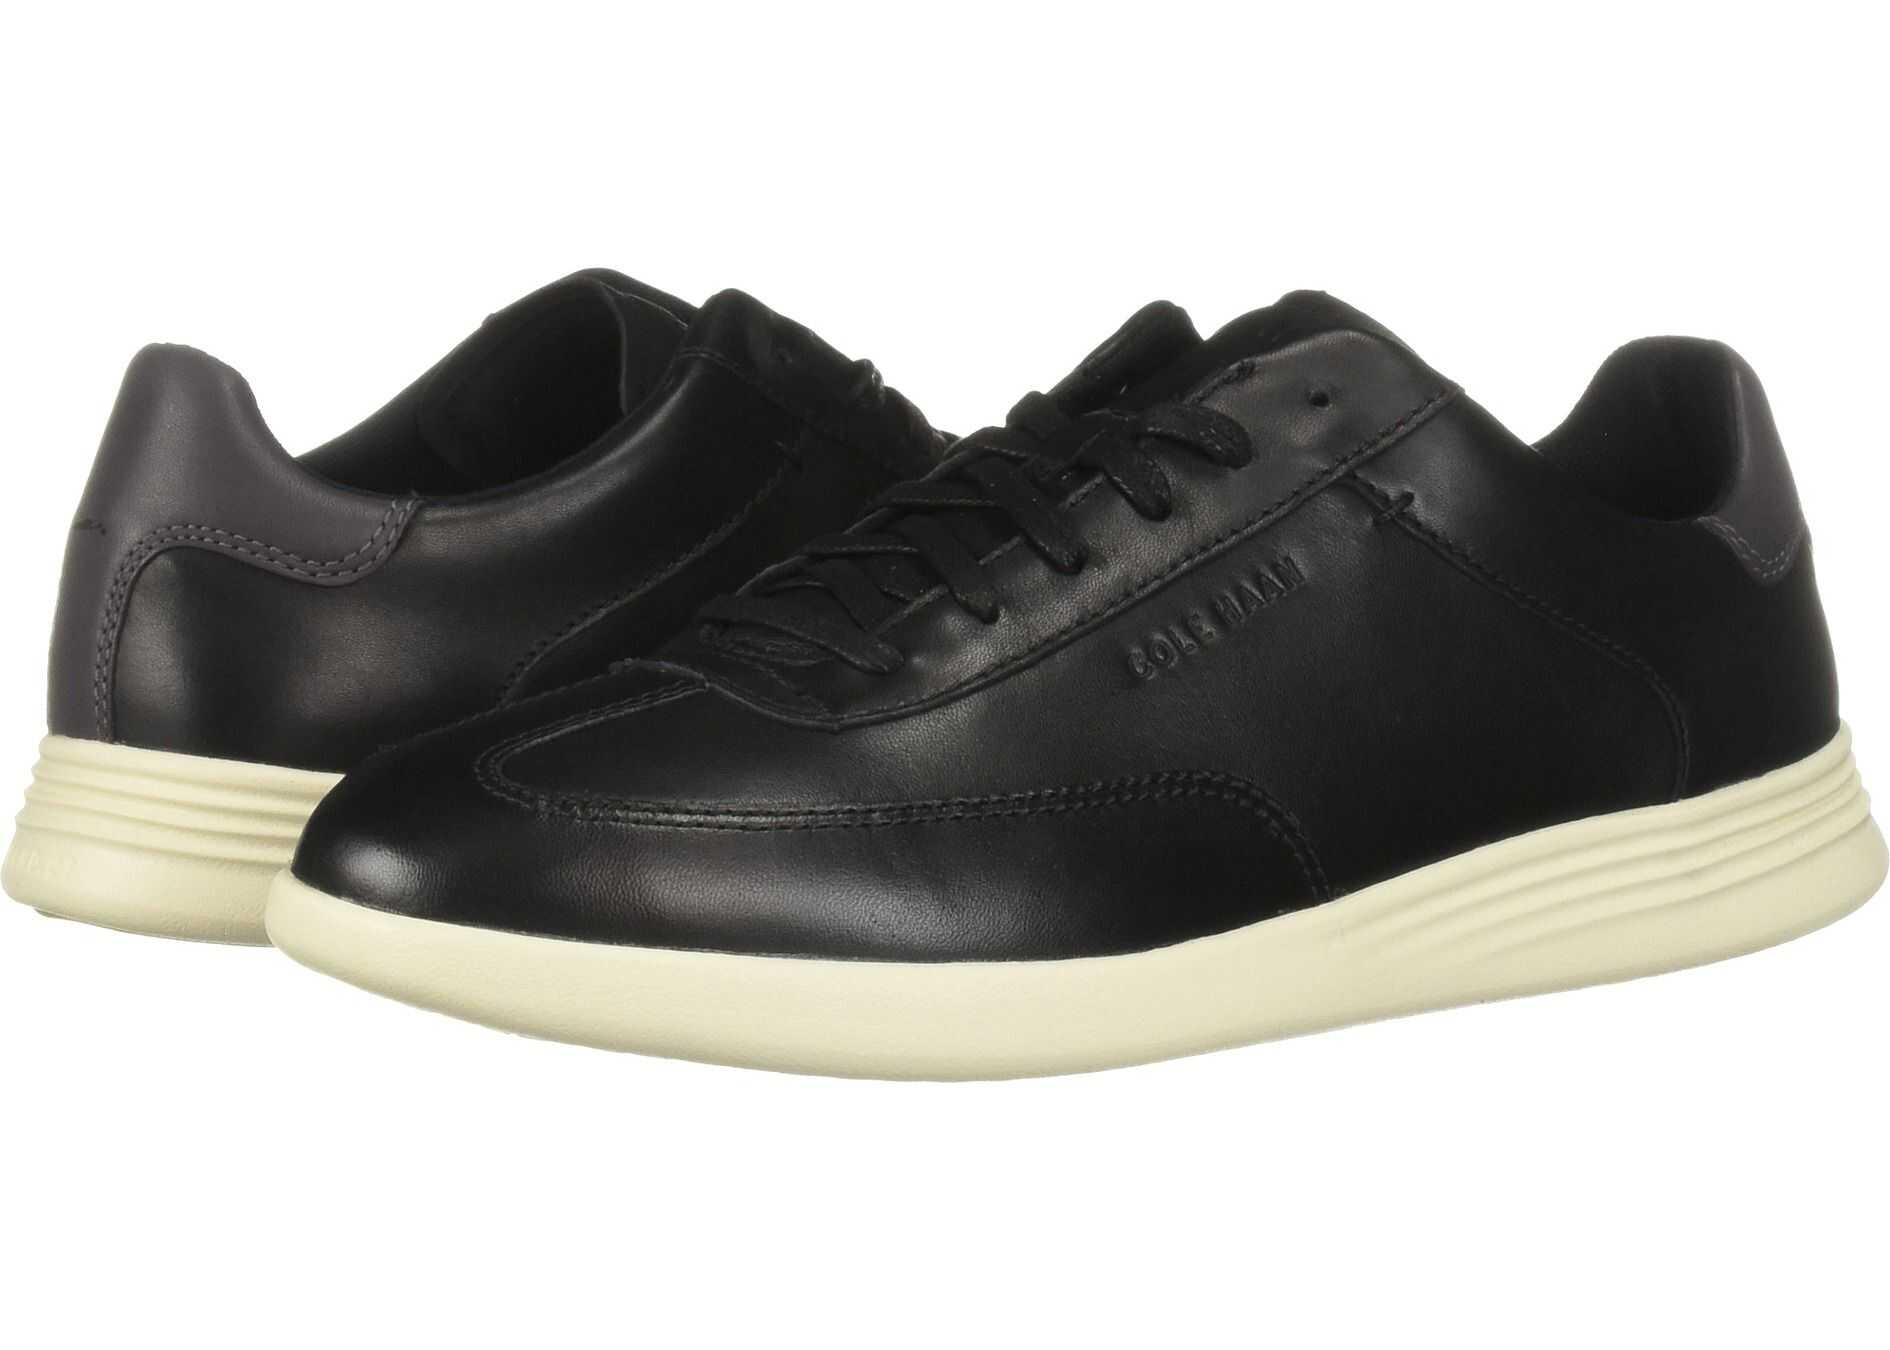 Cole Haan Grand Crosscourt Turf Sneaker Black Leather